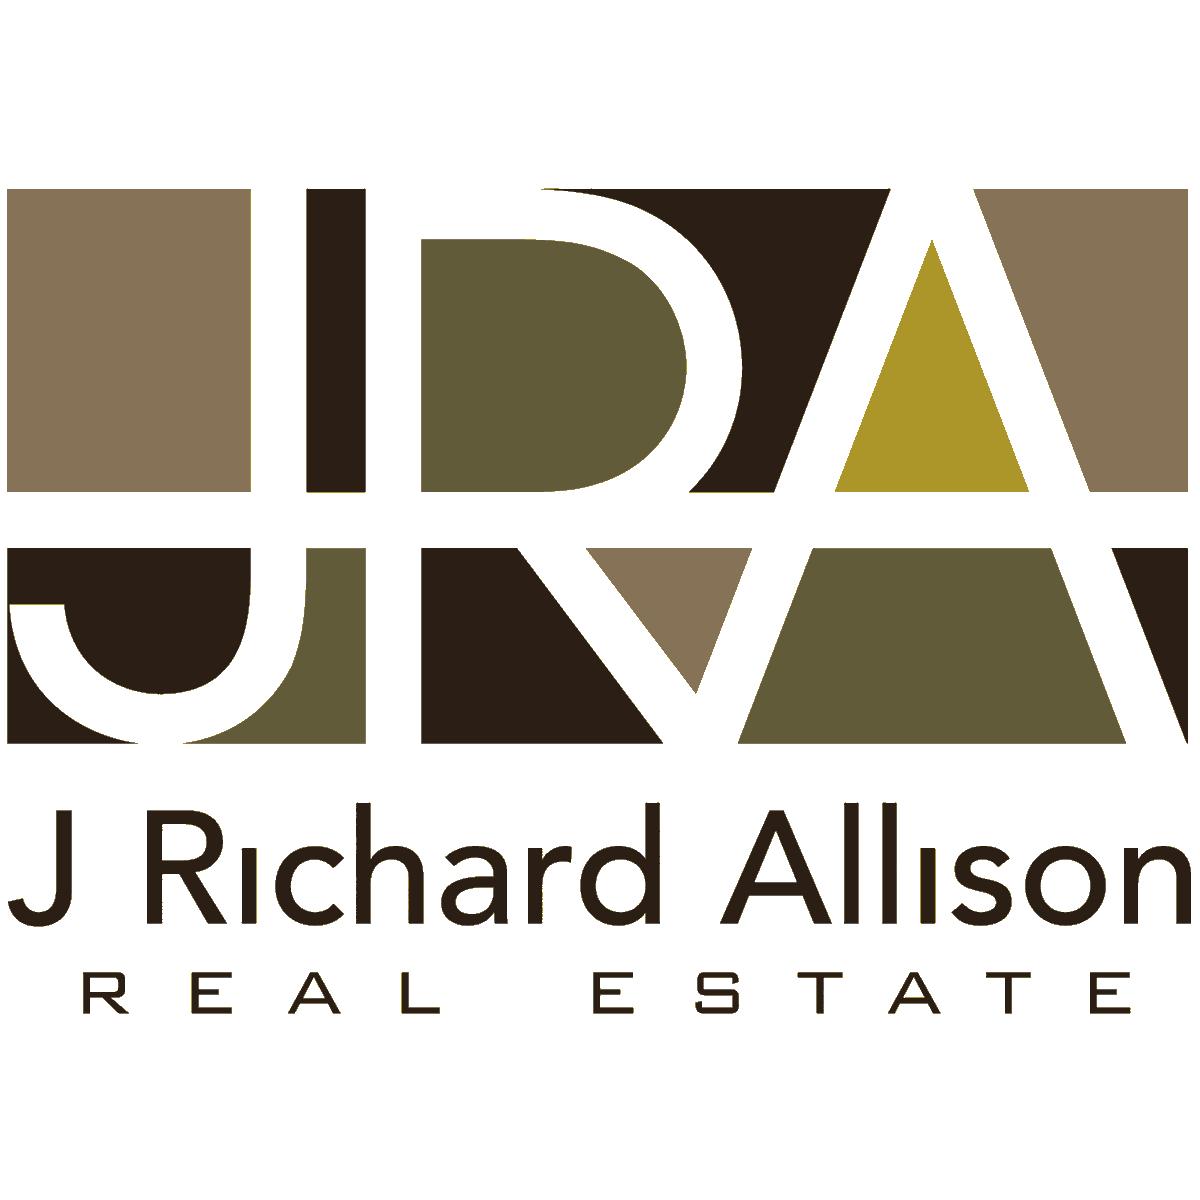 JRA REAL estate